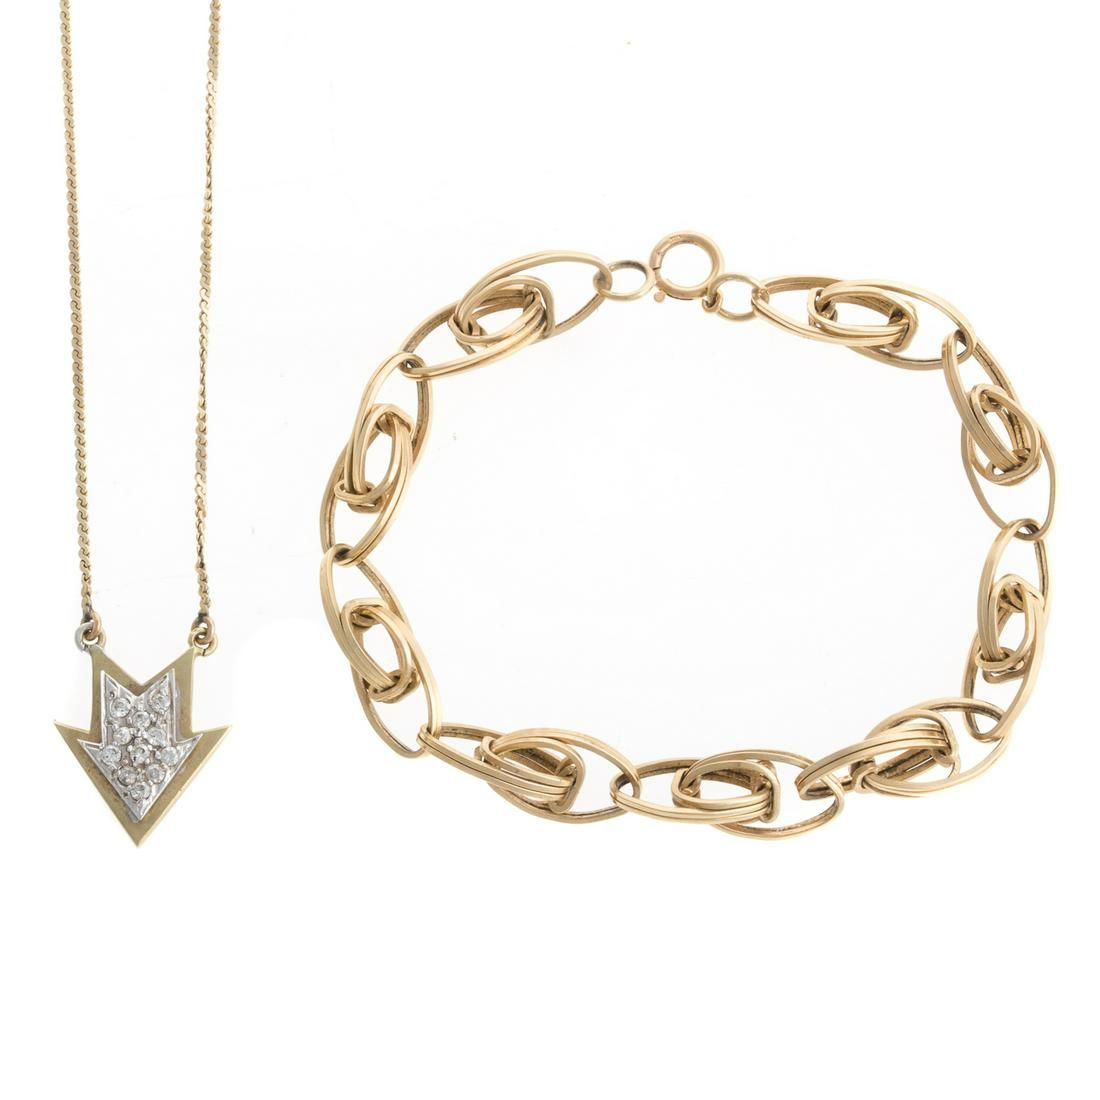 A Diamond Arrow Necklace & Link Bracelet in 14K